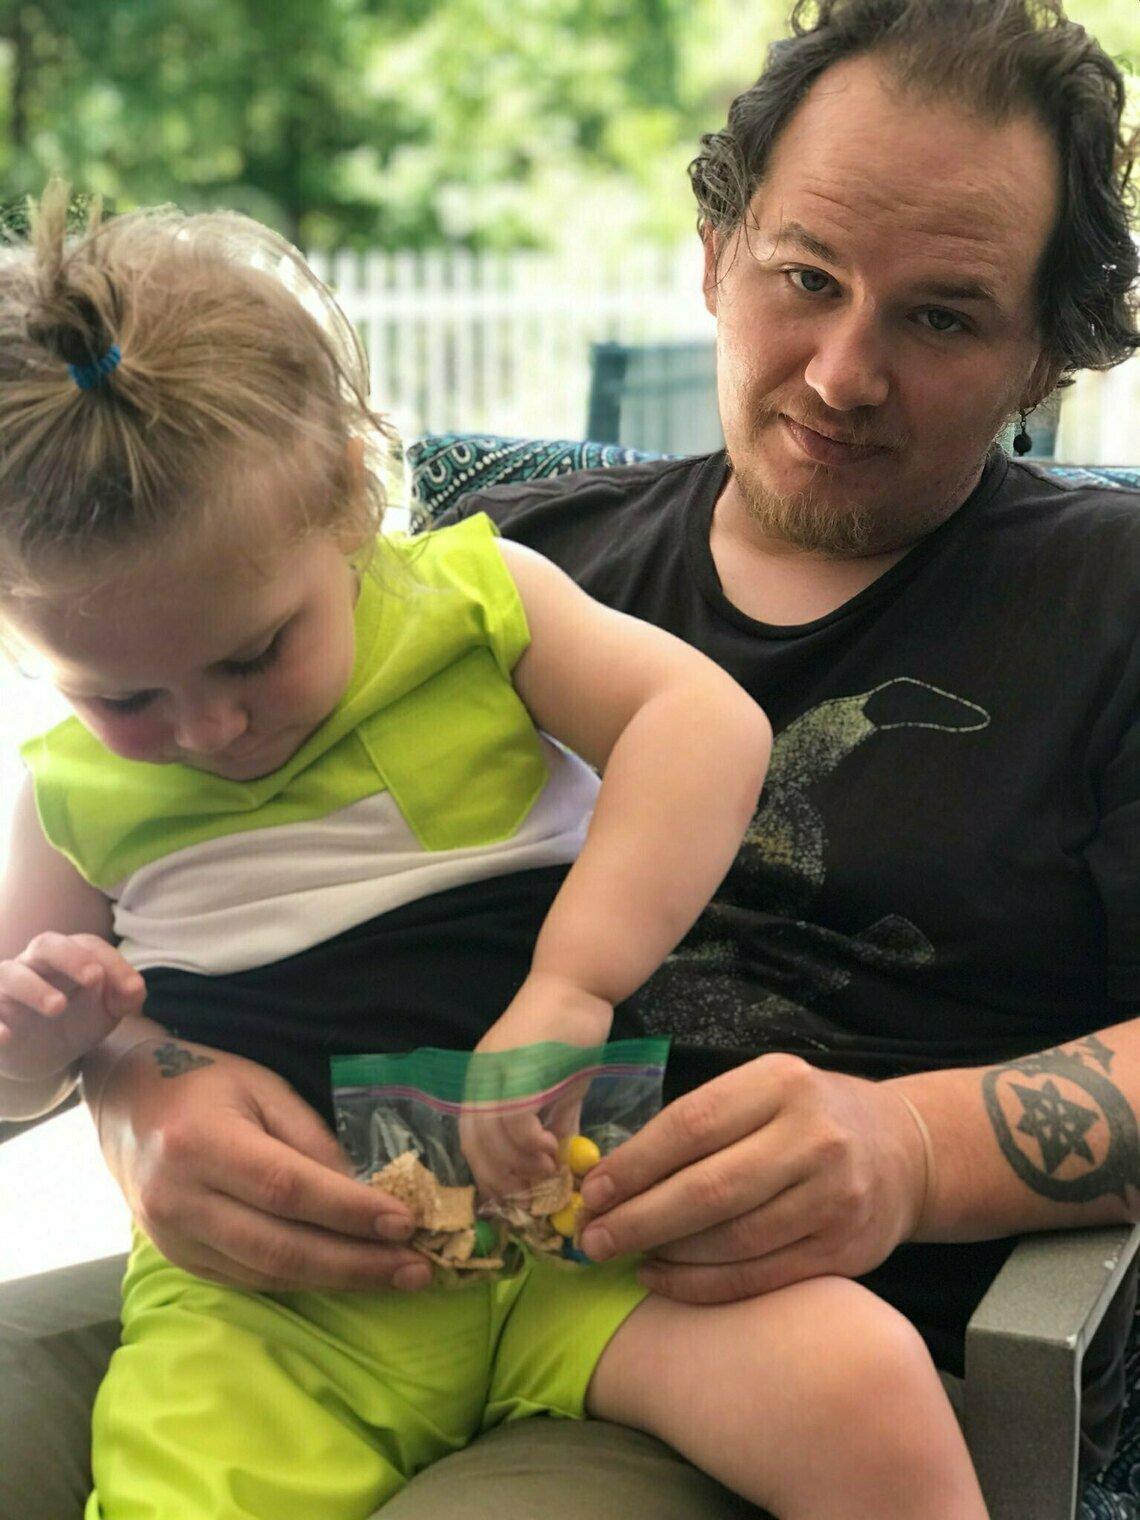 Patrick Fagan with his son Dash.